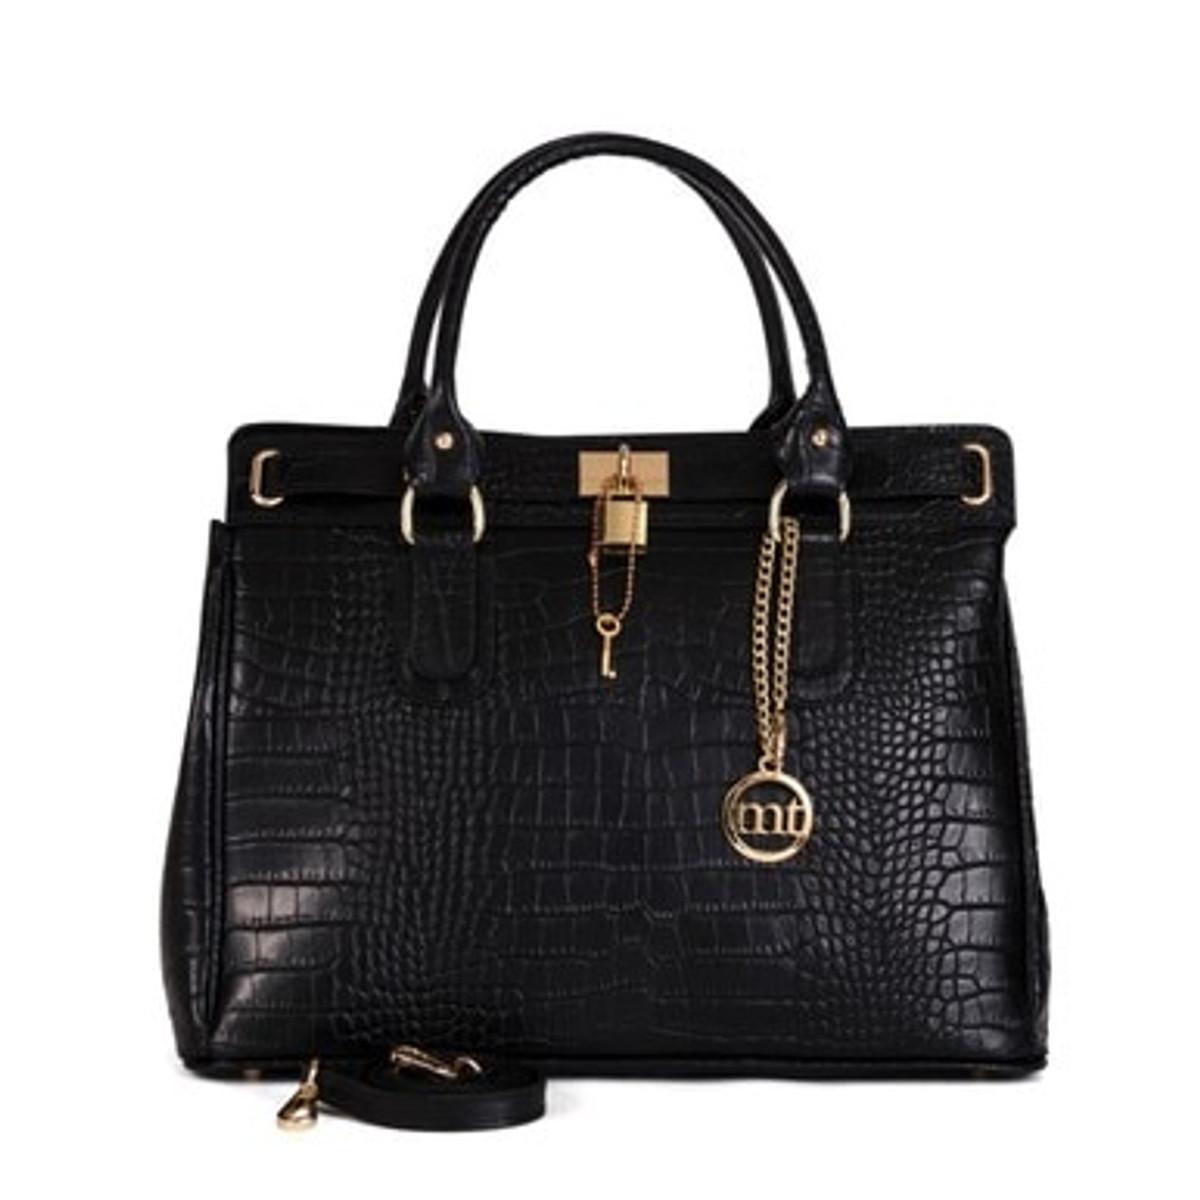 Mia Tomazzi Italian Made Bag WB490801